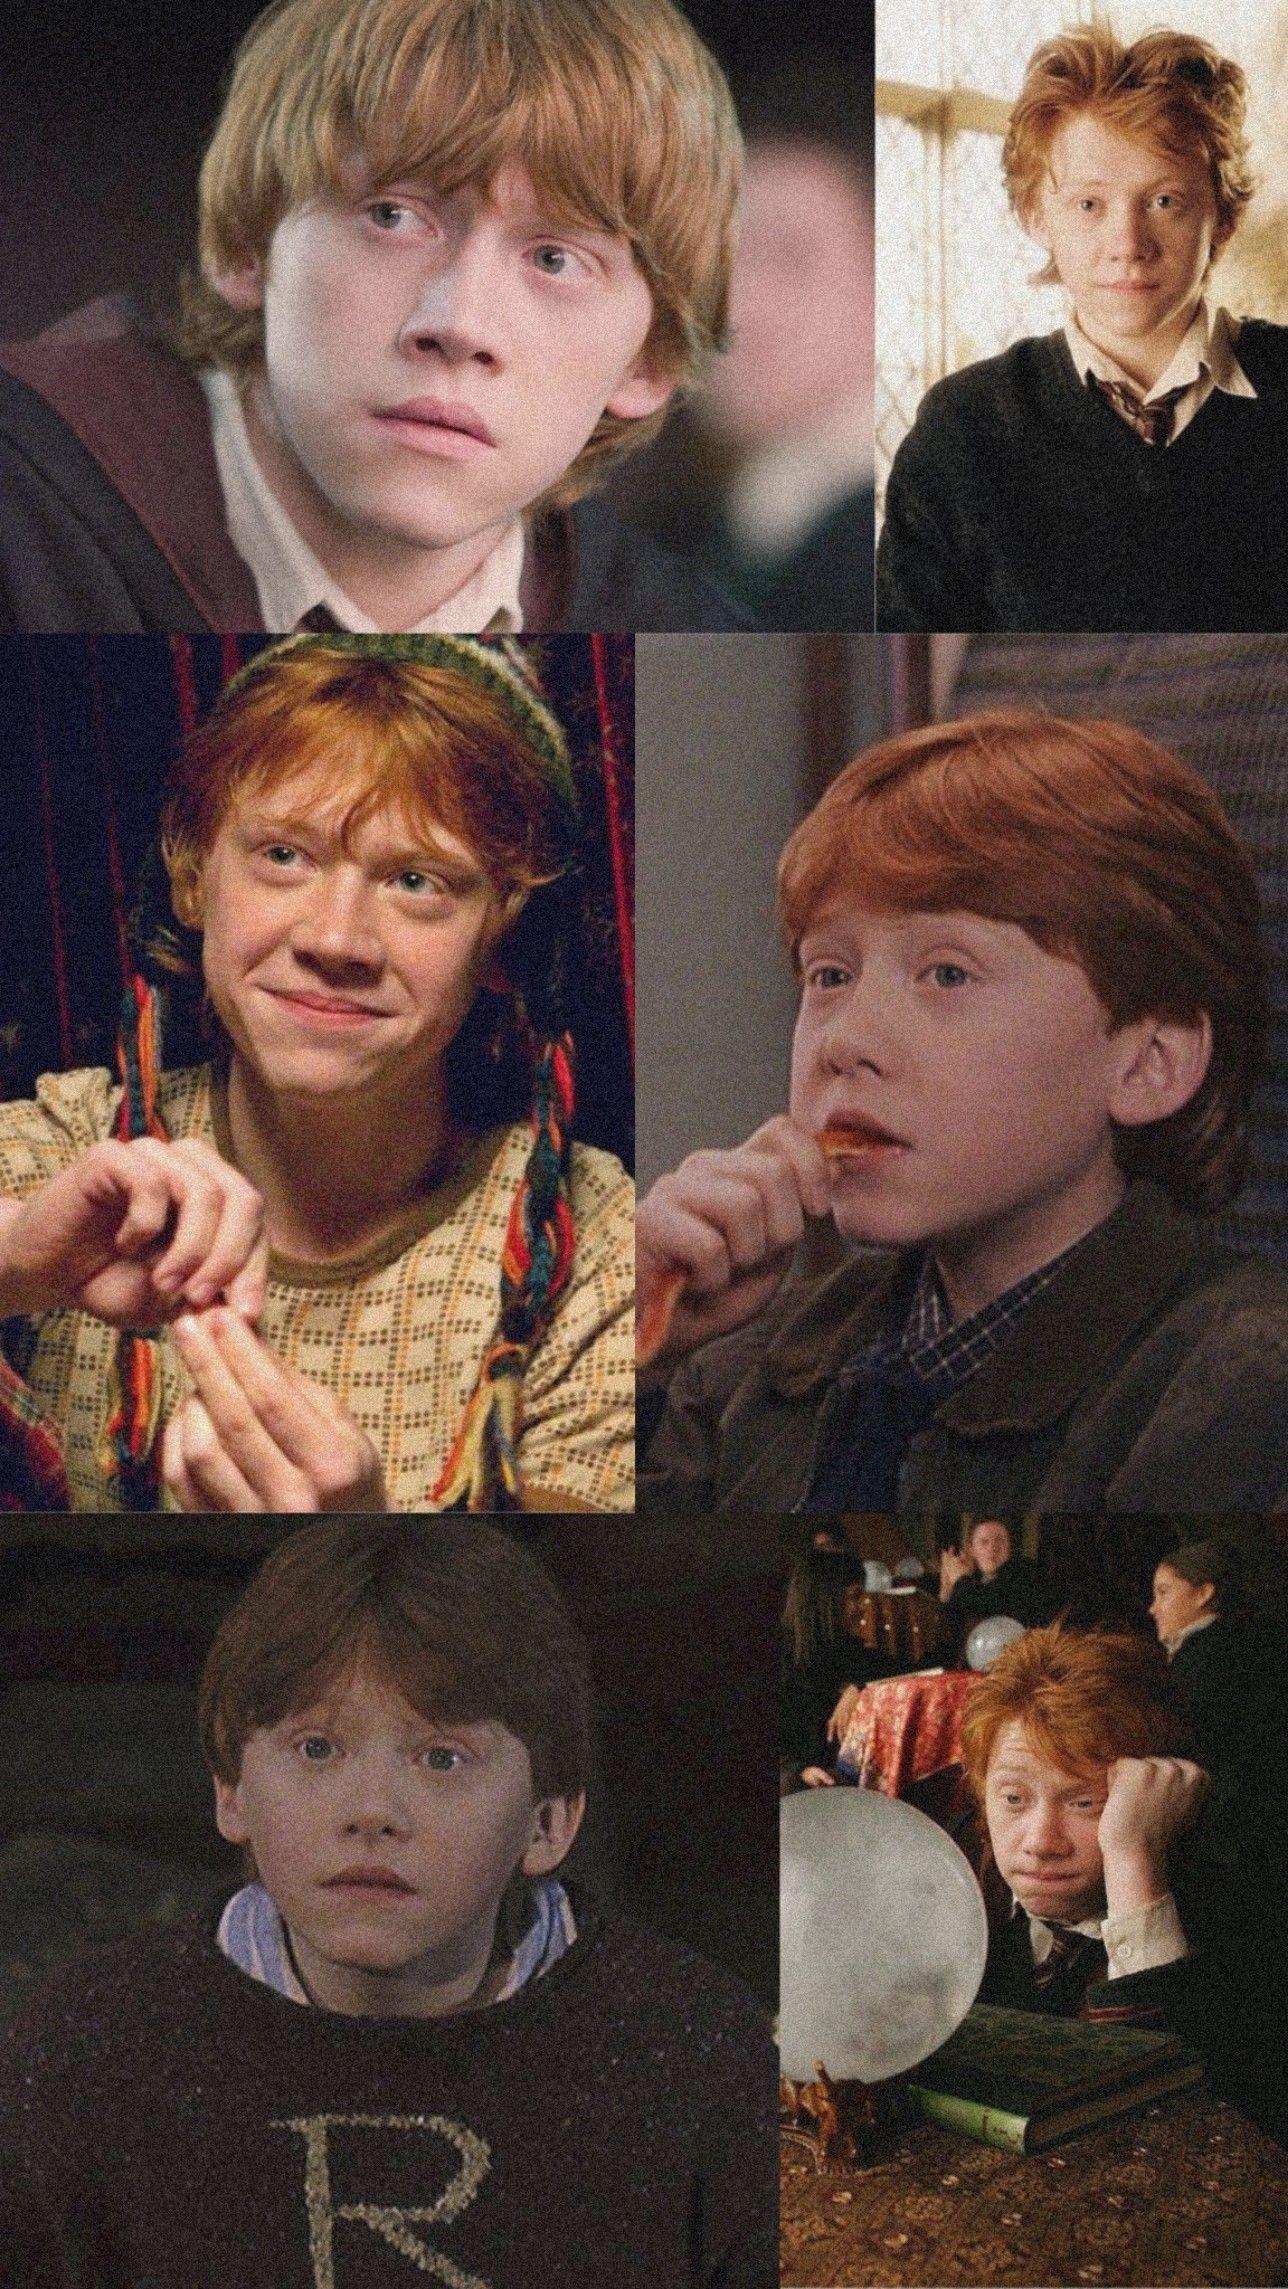 Ron Weasley Vintage Weasley Harry Potter Harry Potter Ron Weasley Harry Potter Ron